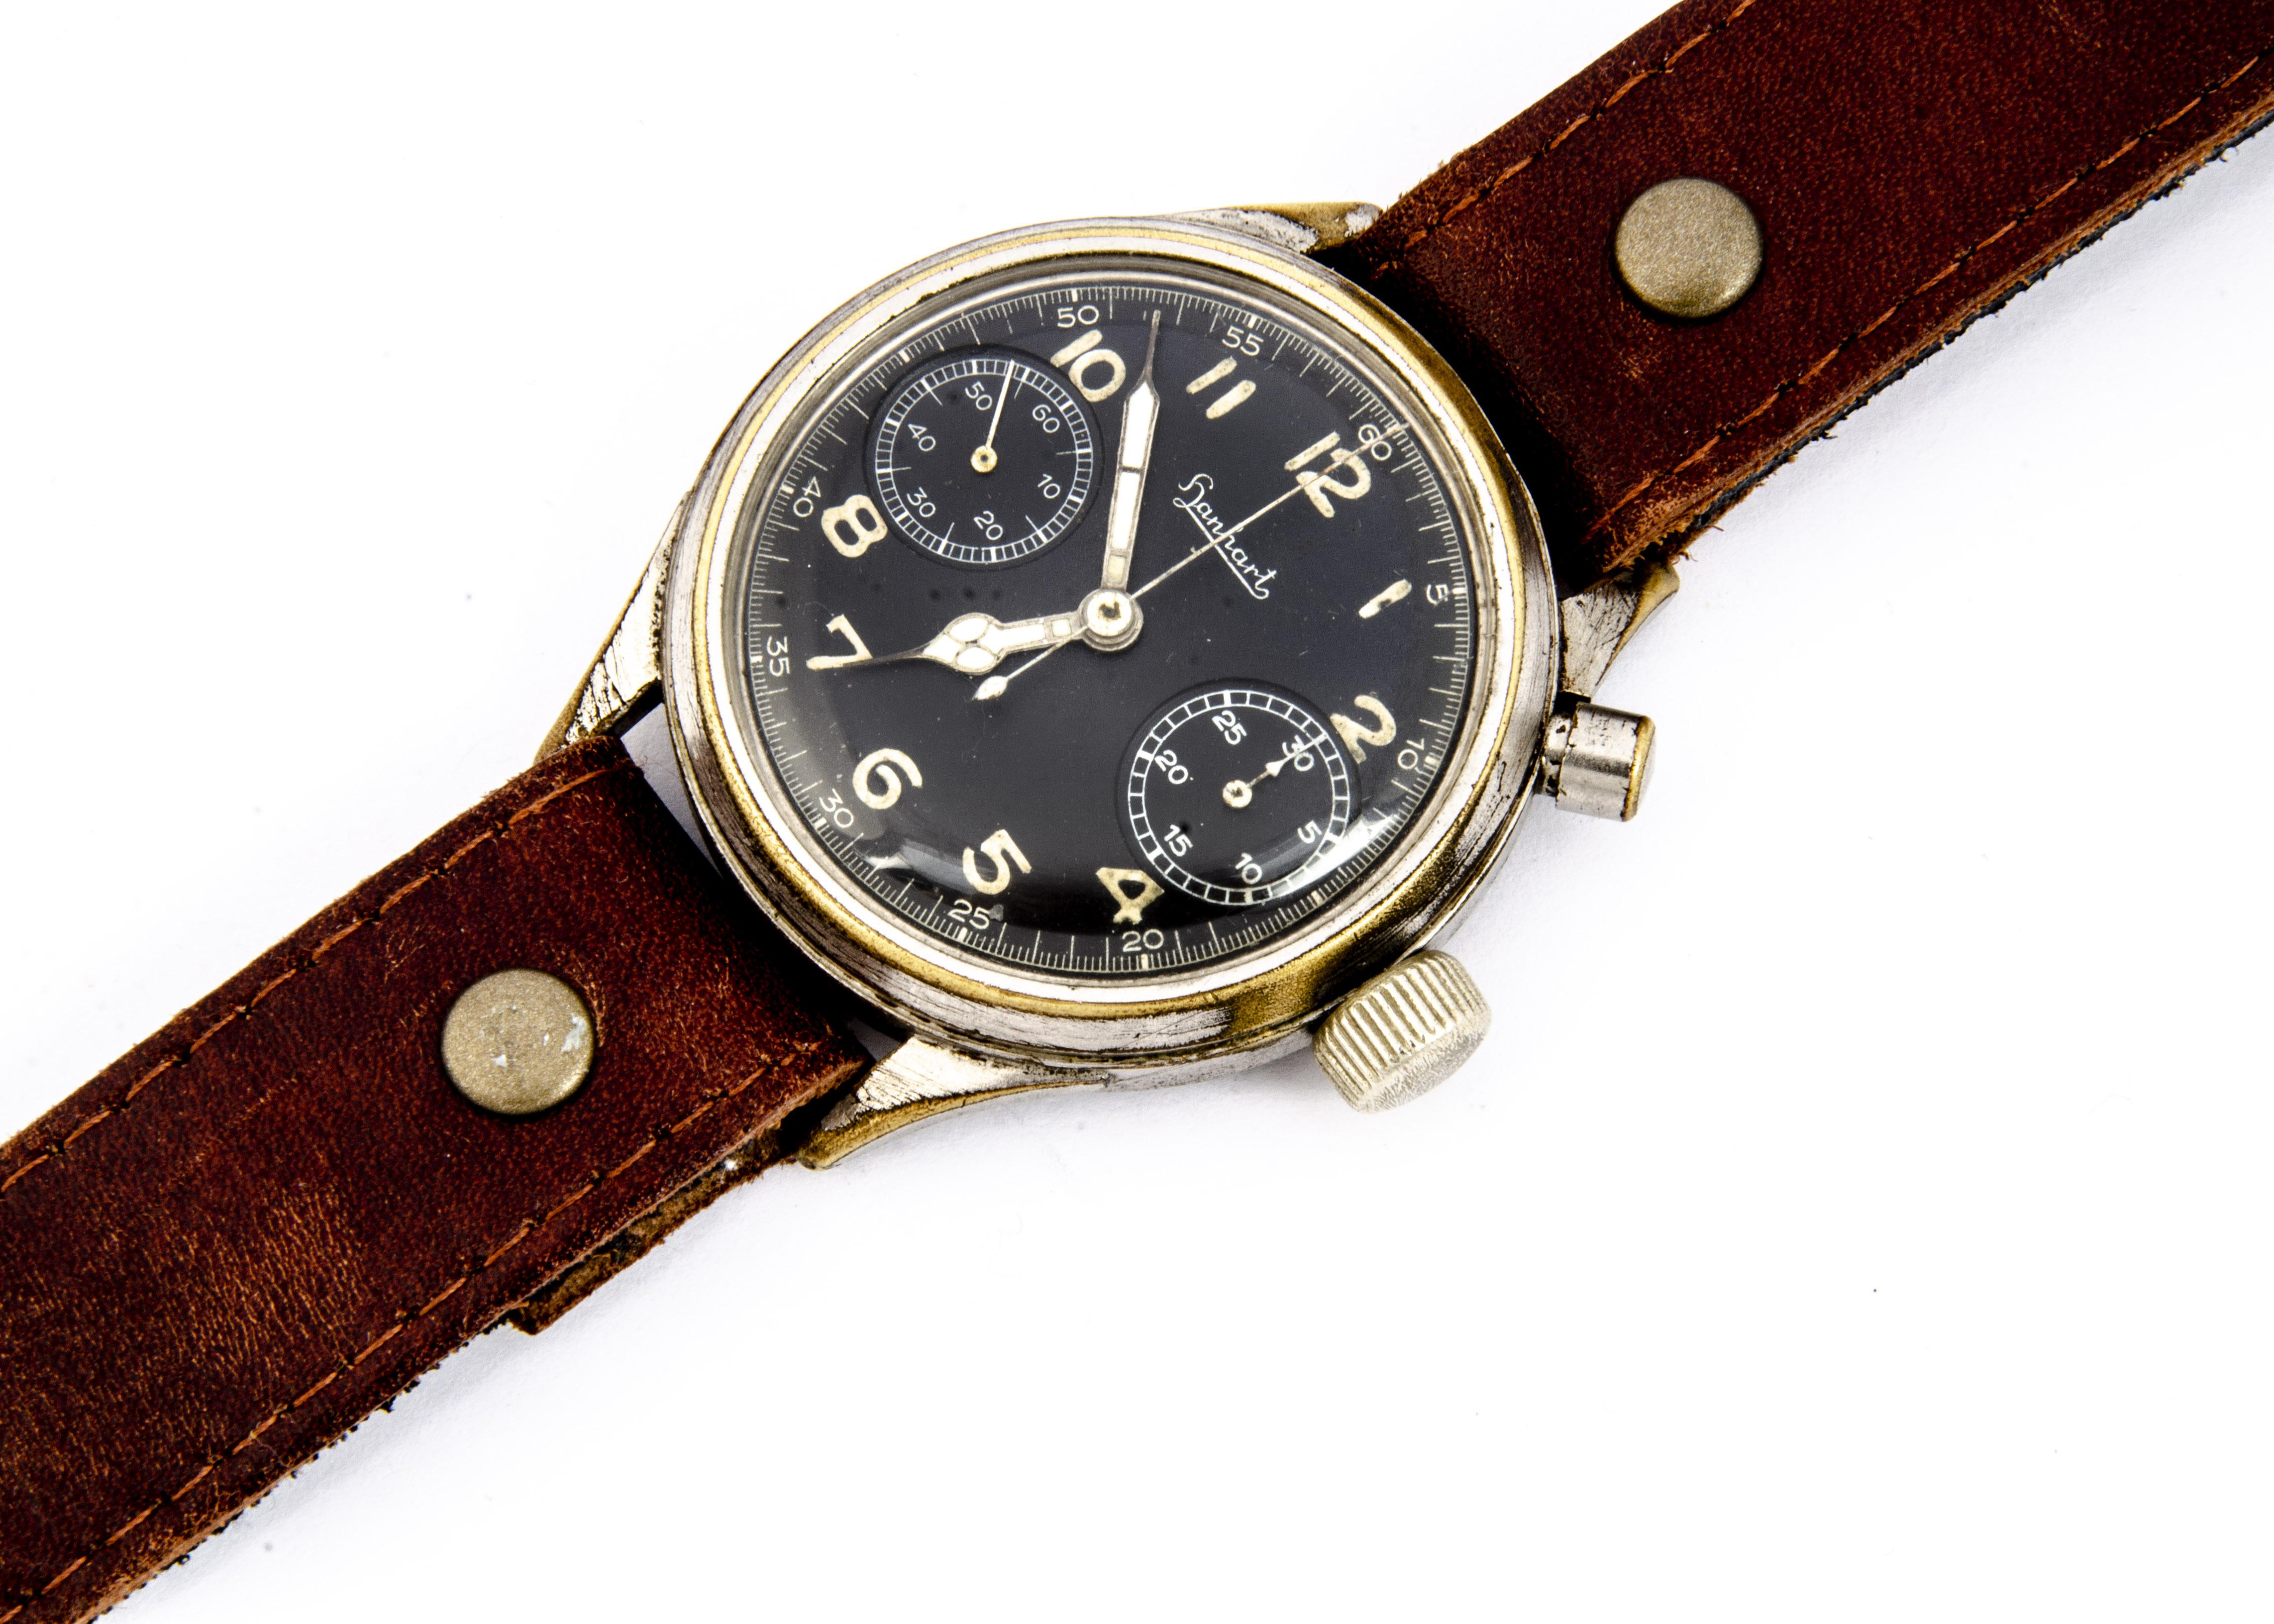 A WWII period Hanhart German Luftwaffe chronograph wristwatch, 40mm plated nickel case, running,